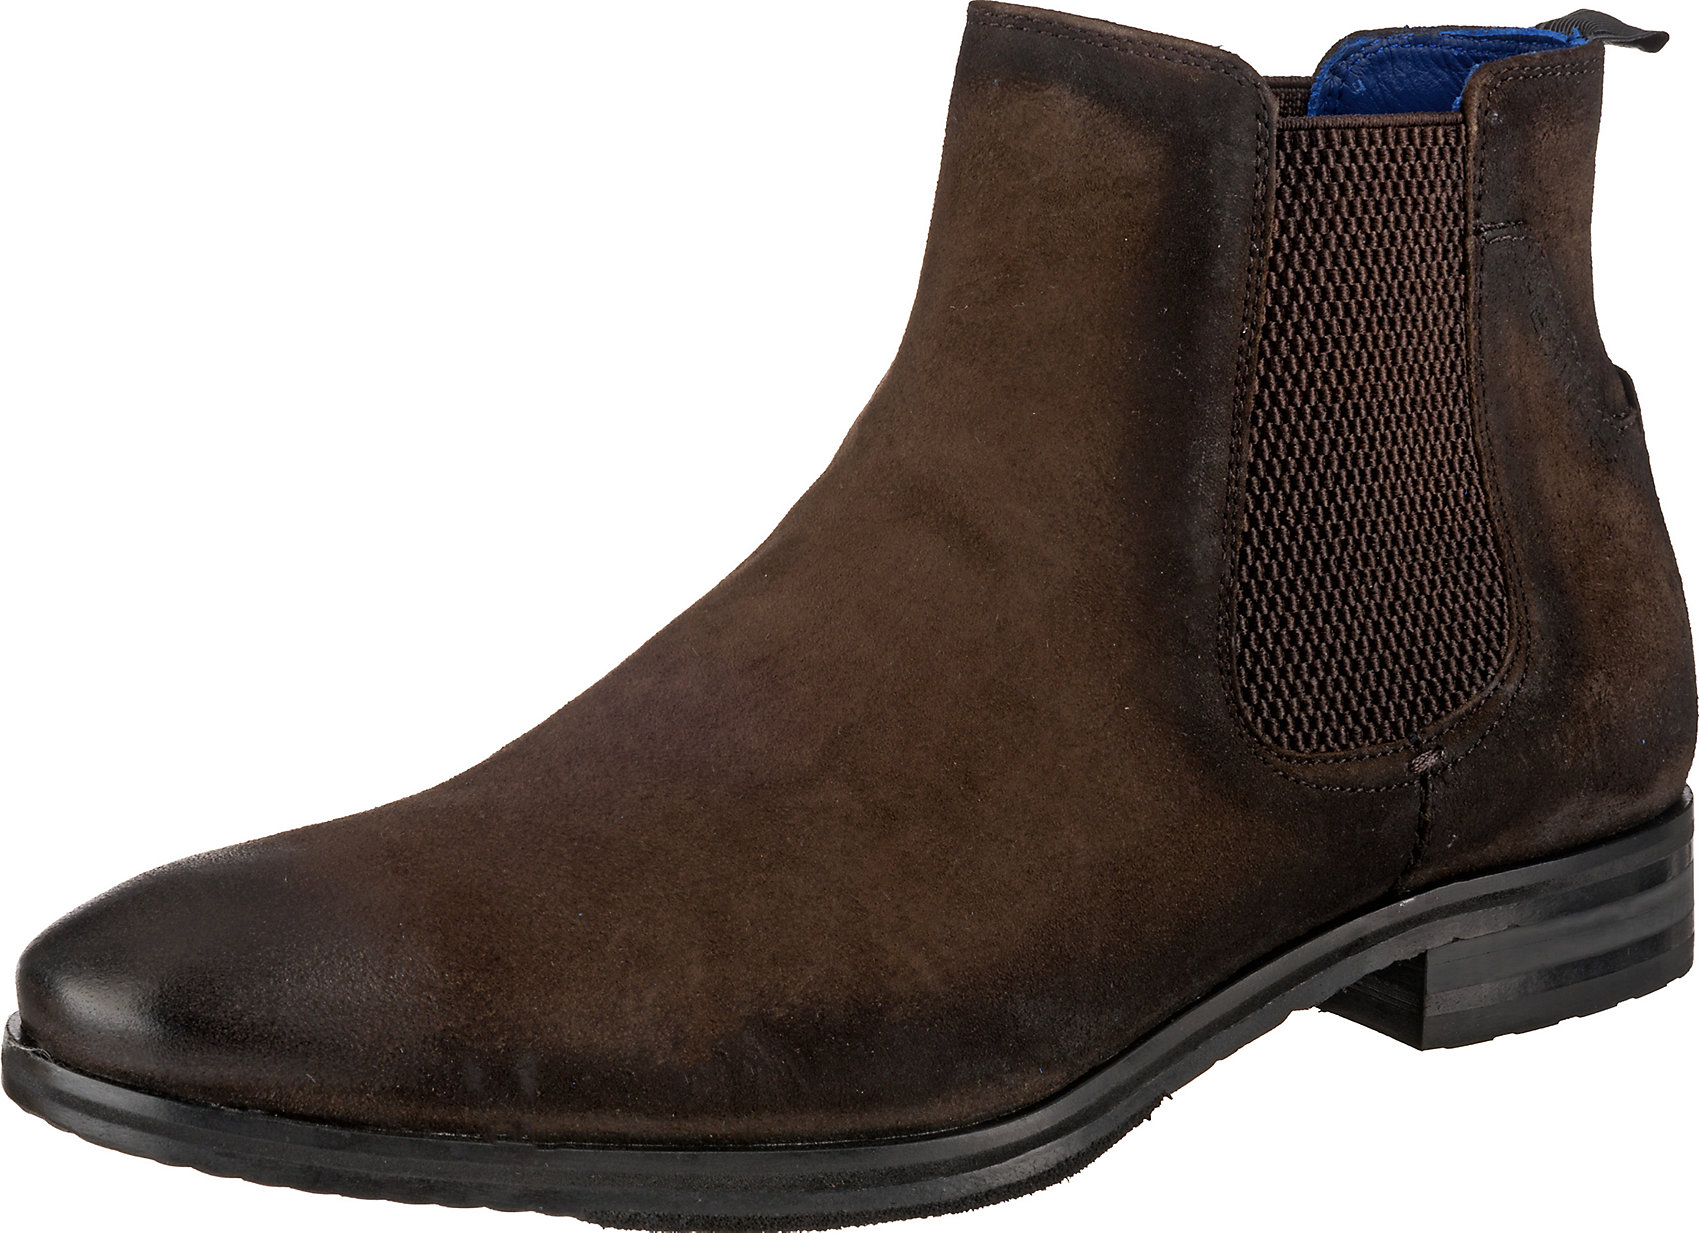 Daniel Details Boots Chelsea 8692193 Neu Hechter Für Zu Dunkelbraun Herren b76fgy